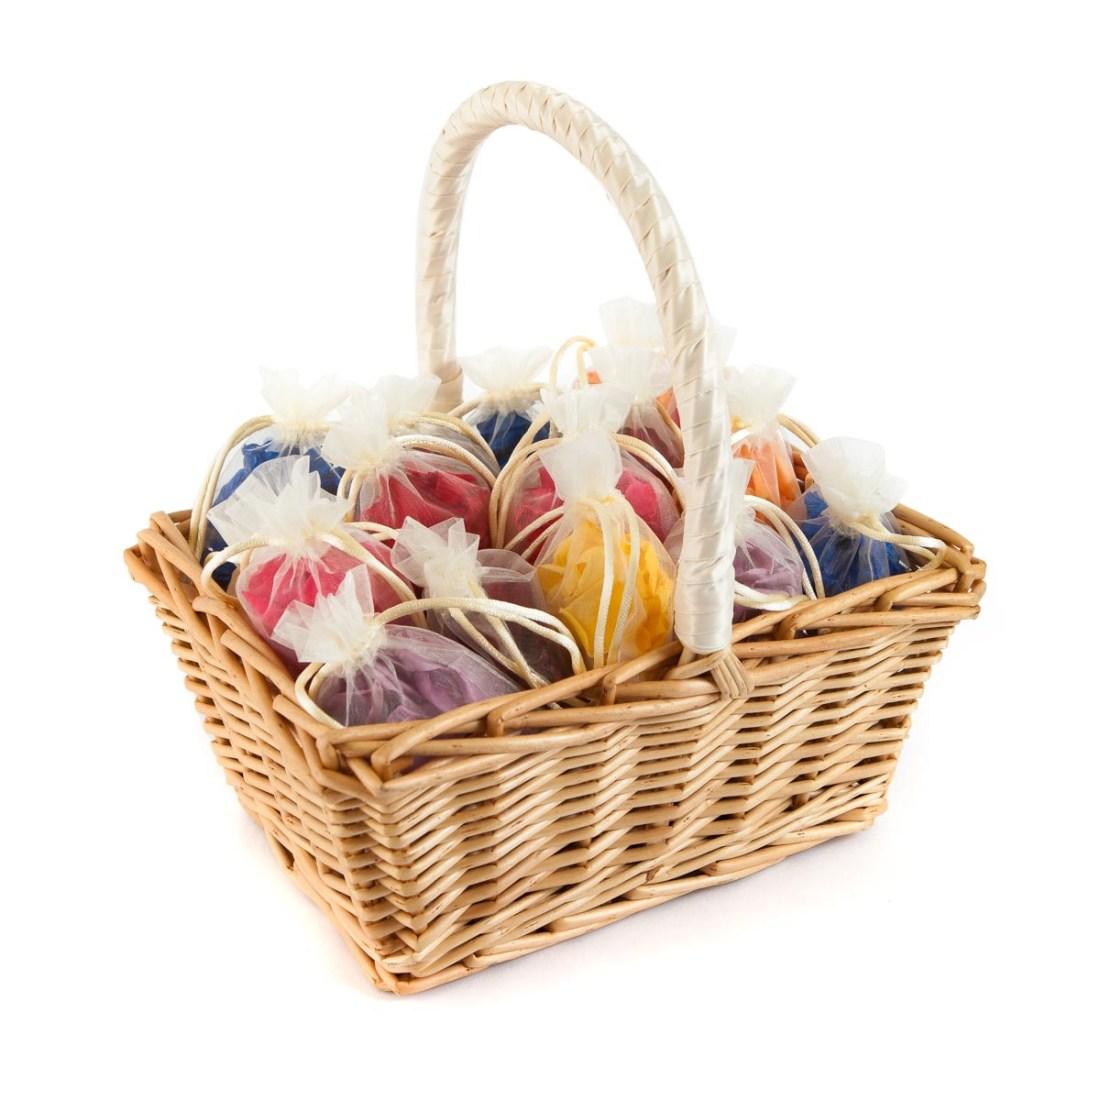 Flower Girl Baskets - colourful petal bags